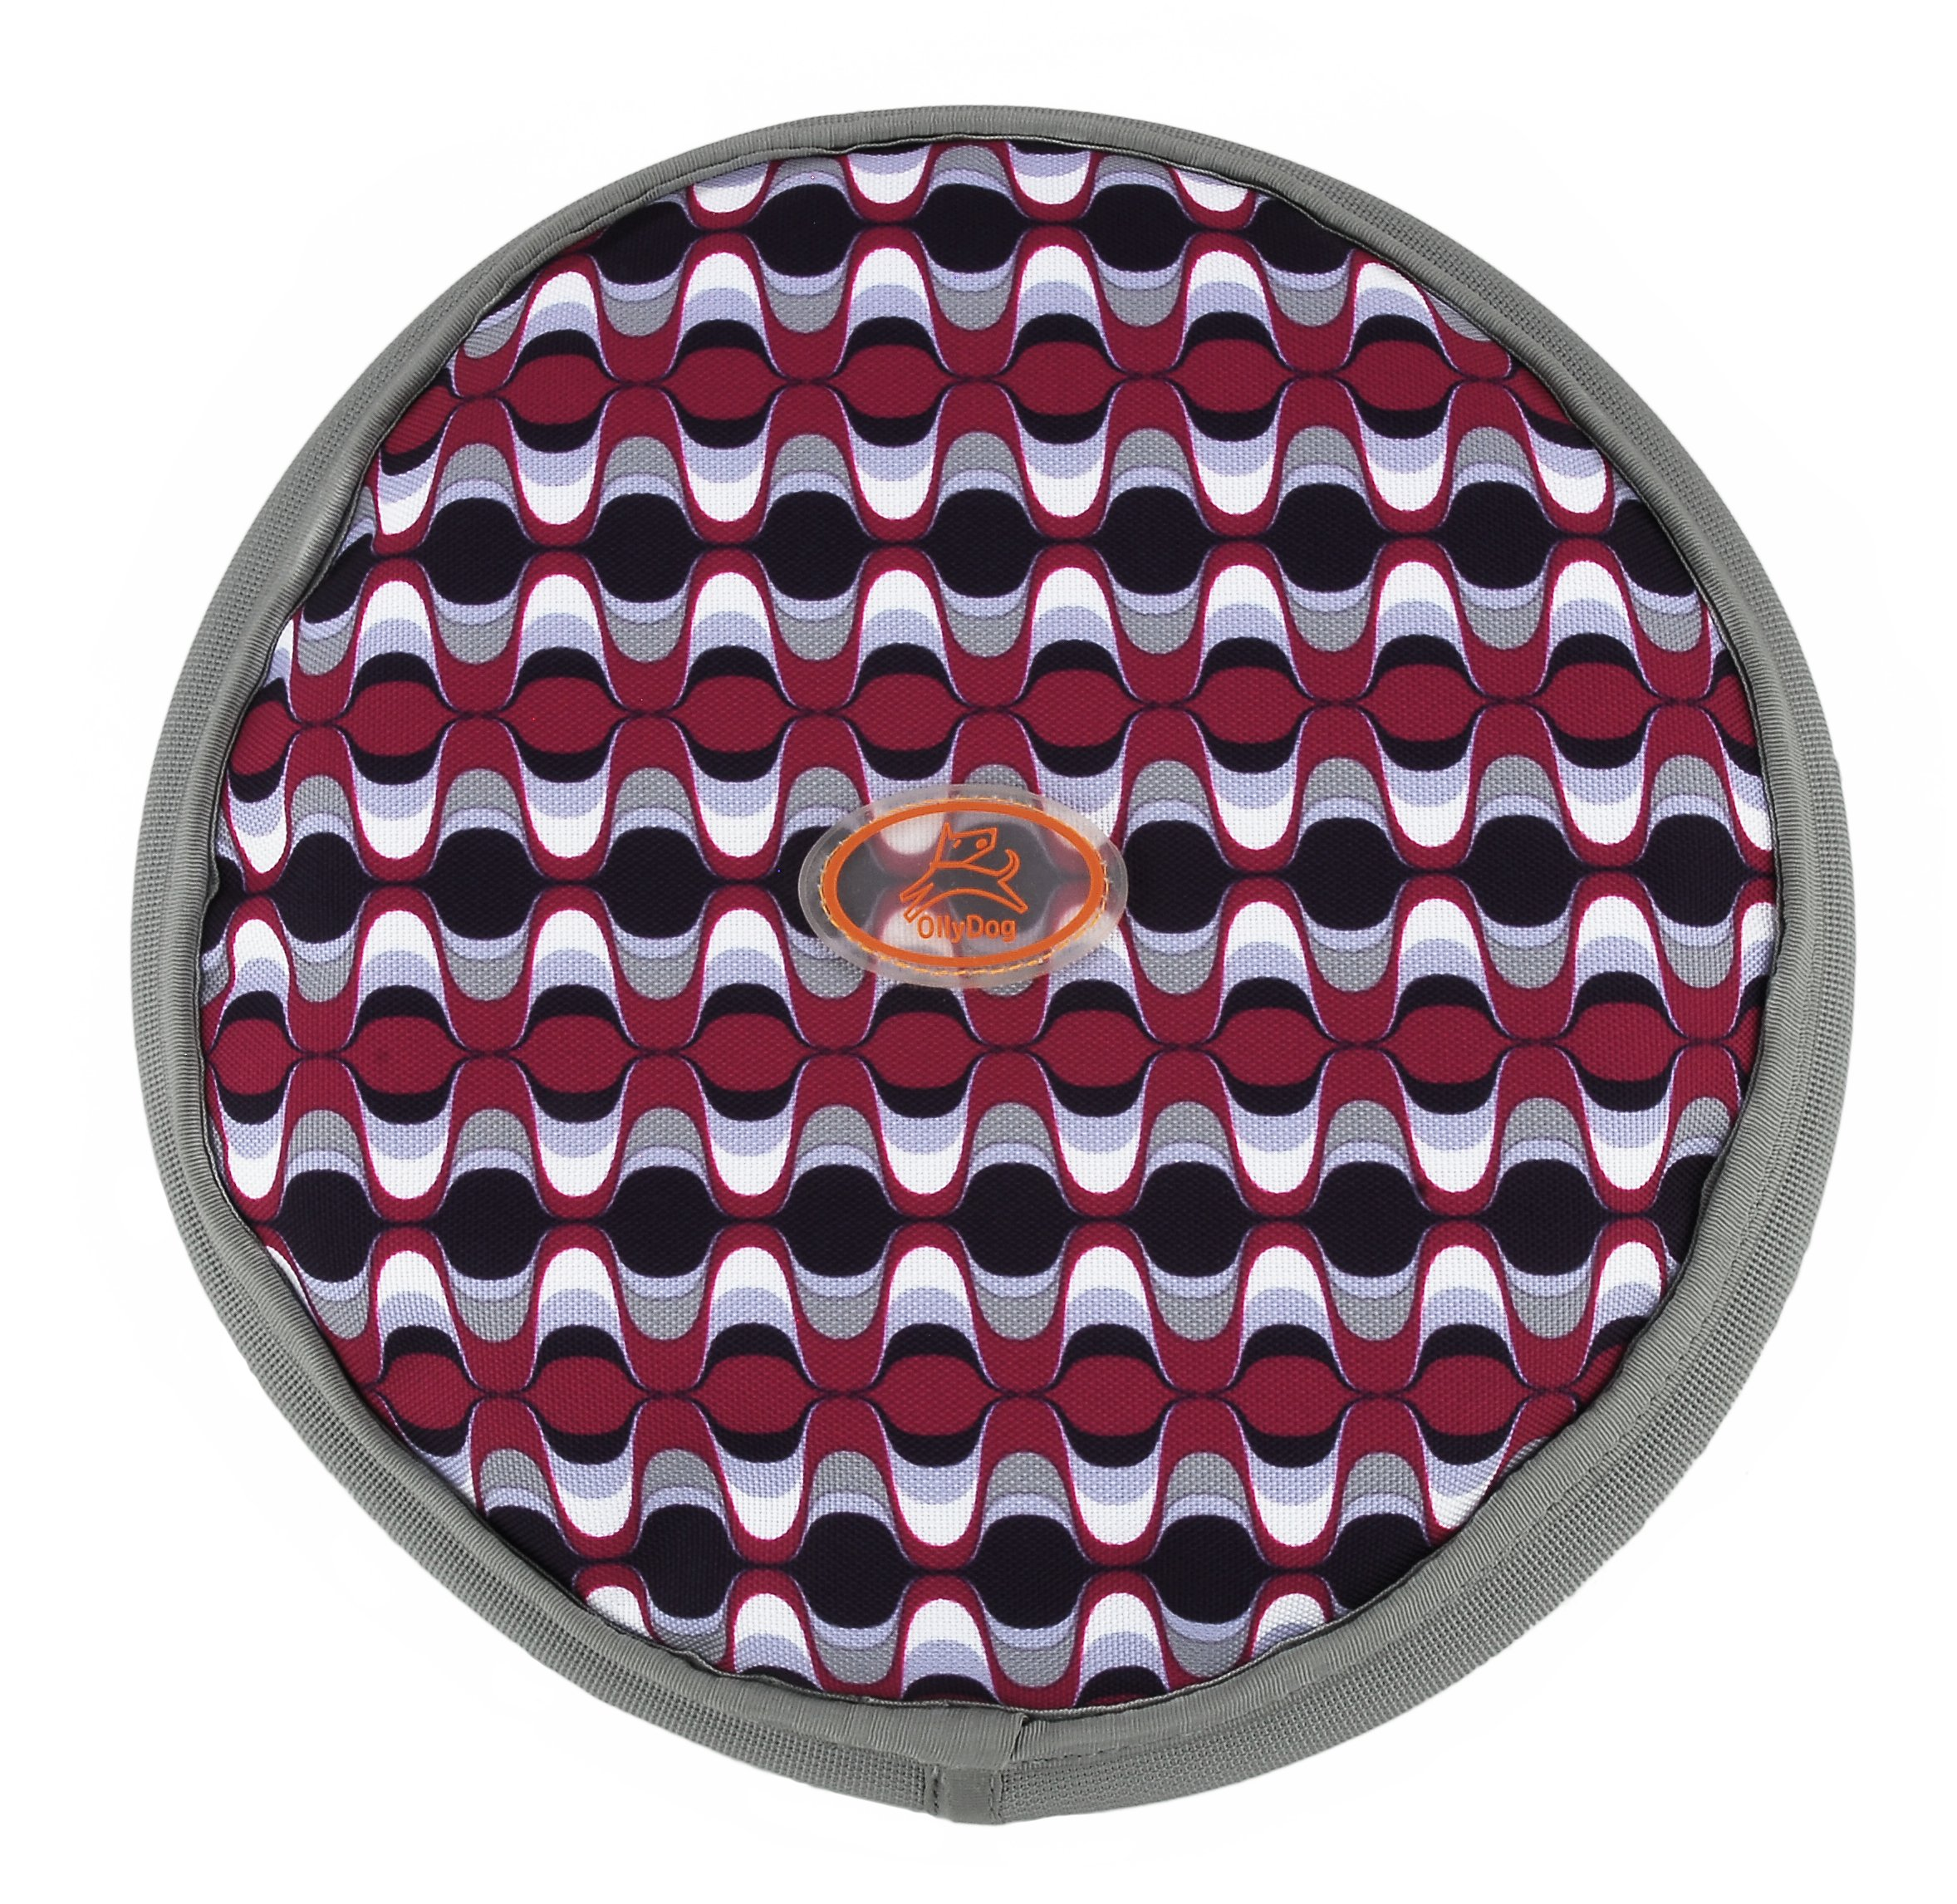 OllyDog OllyFlinger Flying Disc, Medium, Wine Mod